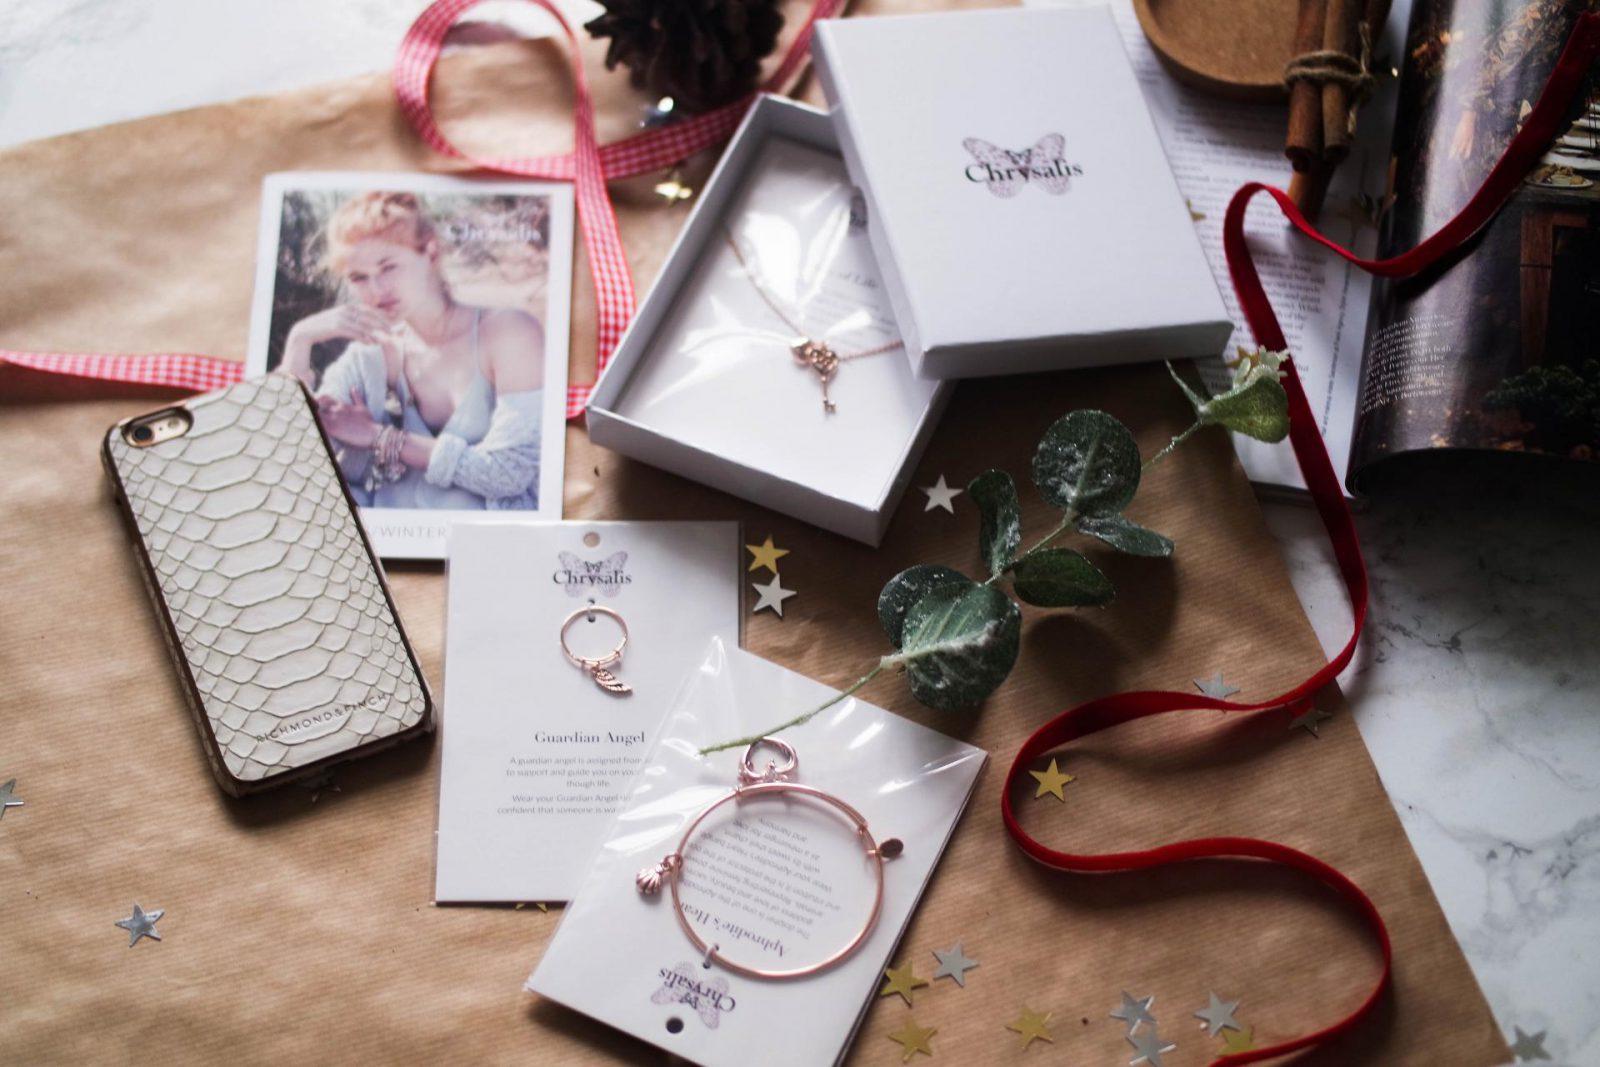 Getting Personal - Christmas Gifting With Chrysalis